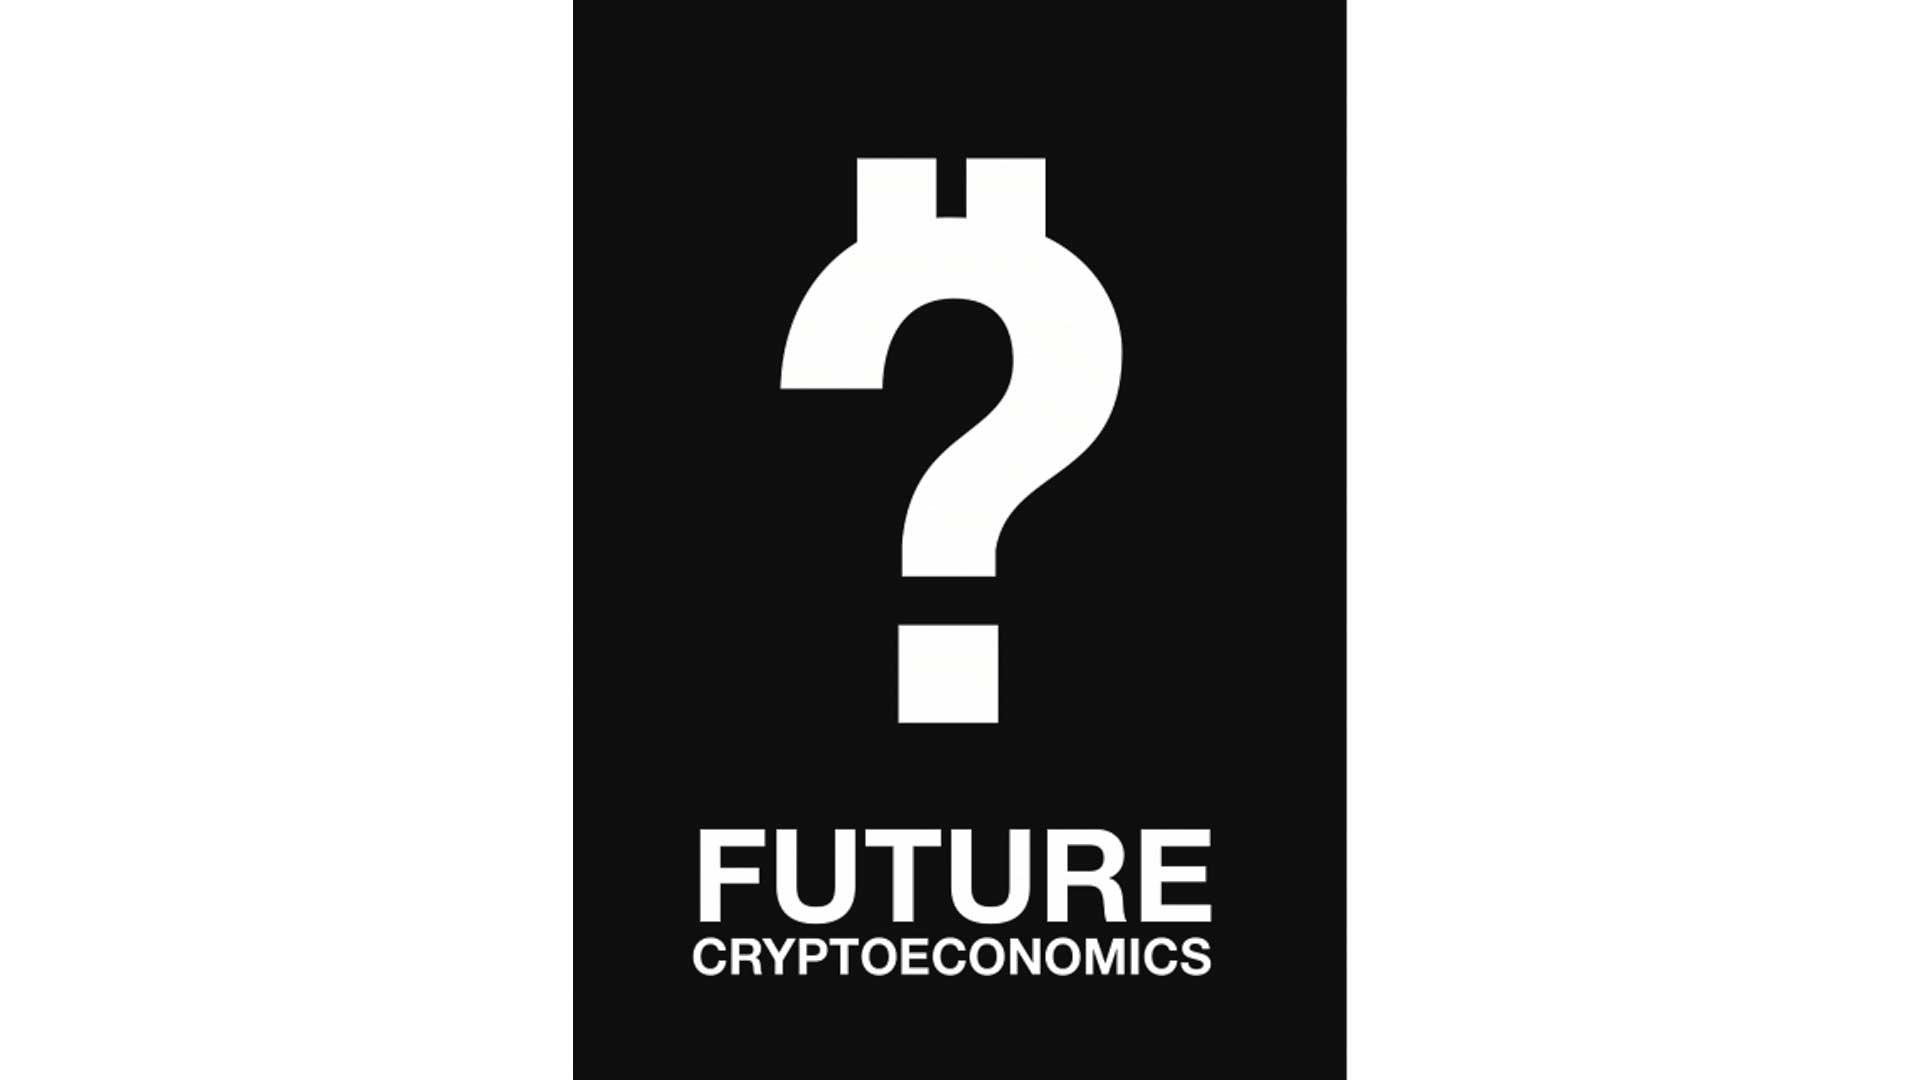 future cryptoeconomics: the genesis stack